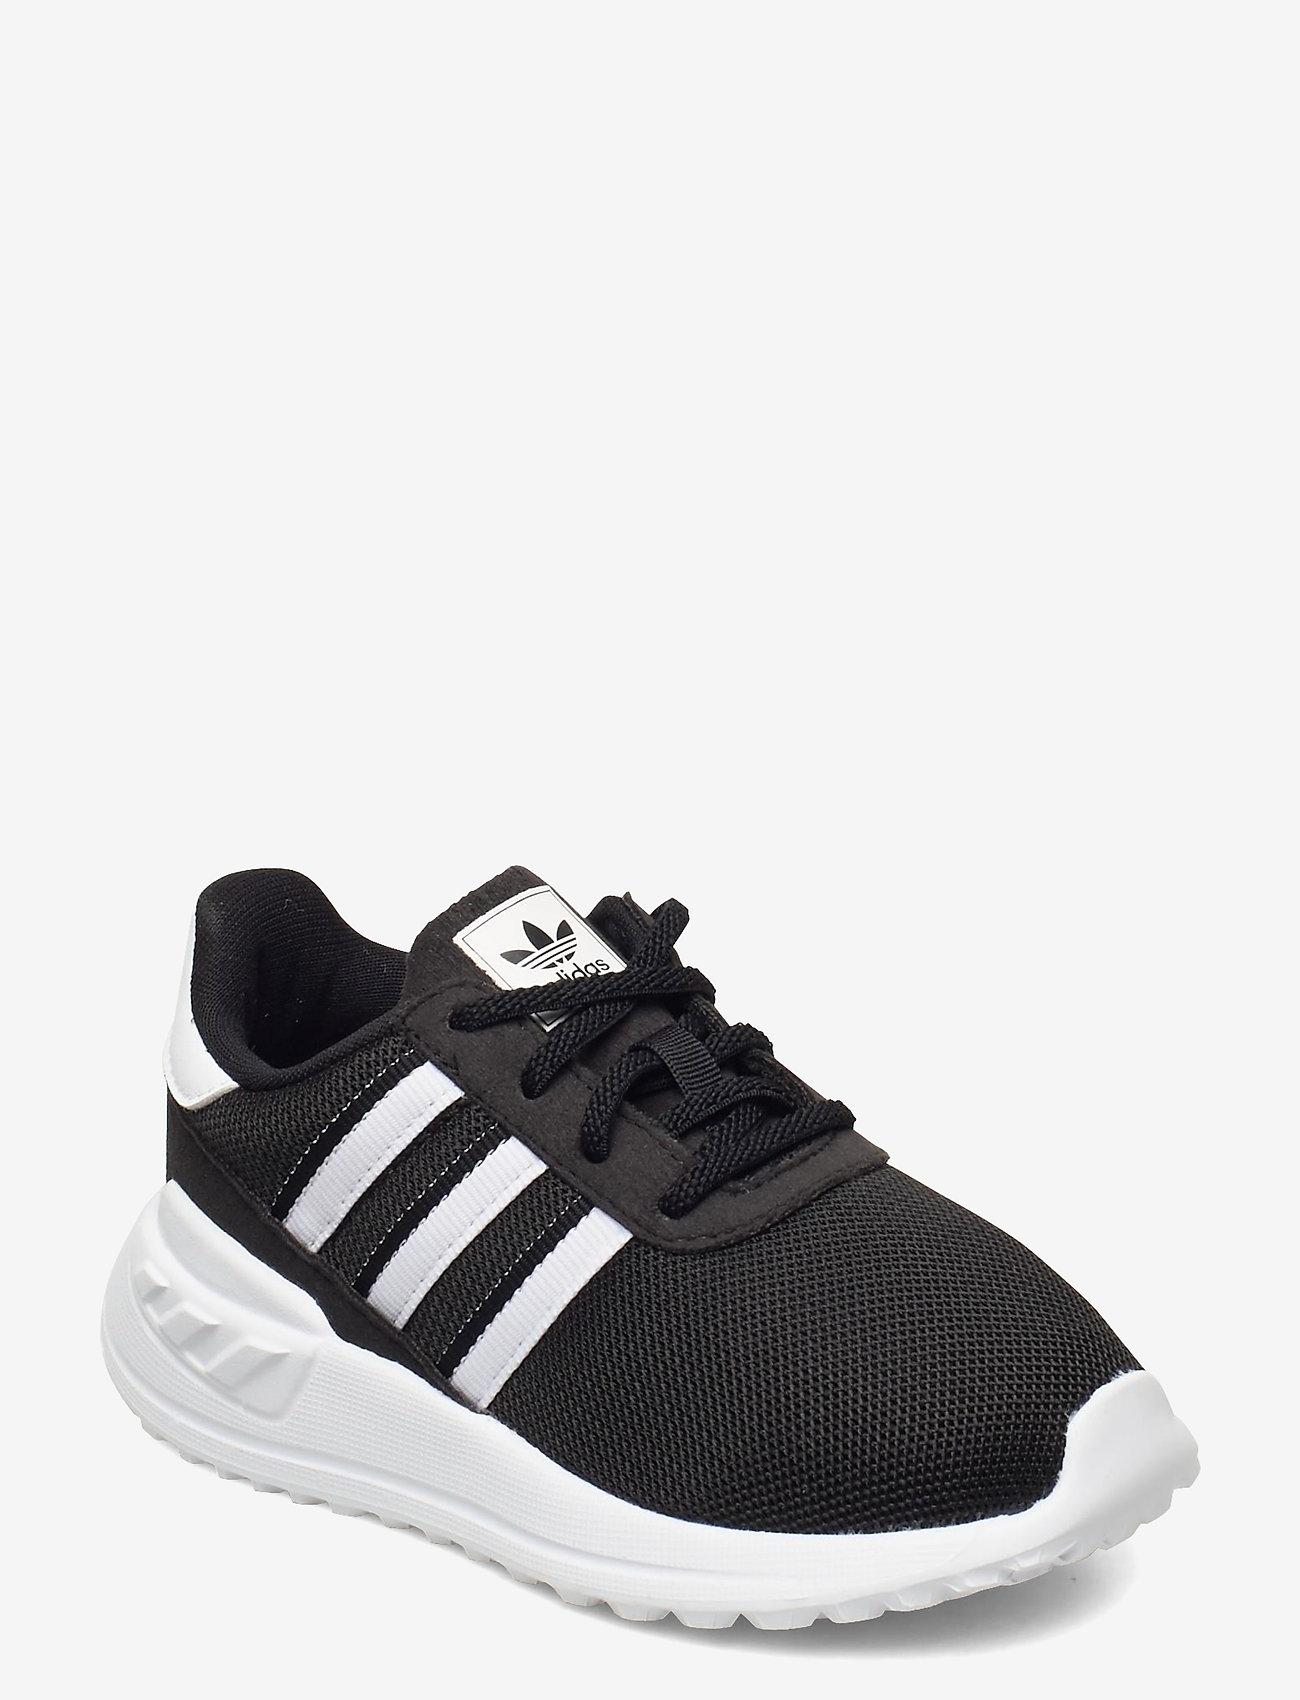 adidas Originals - La Trainer Lite - niedriger schnitt - cblack/ftwwht/cblack - 0